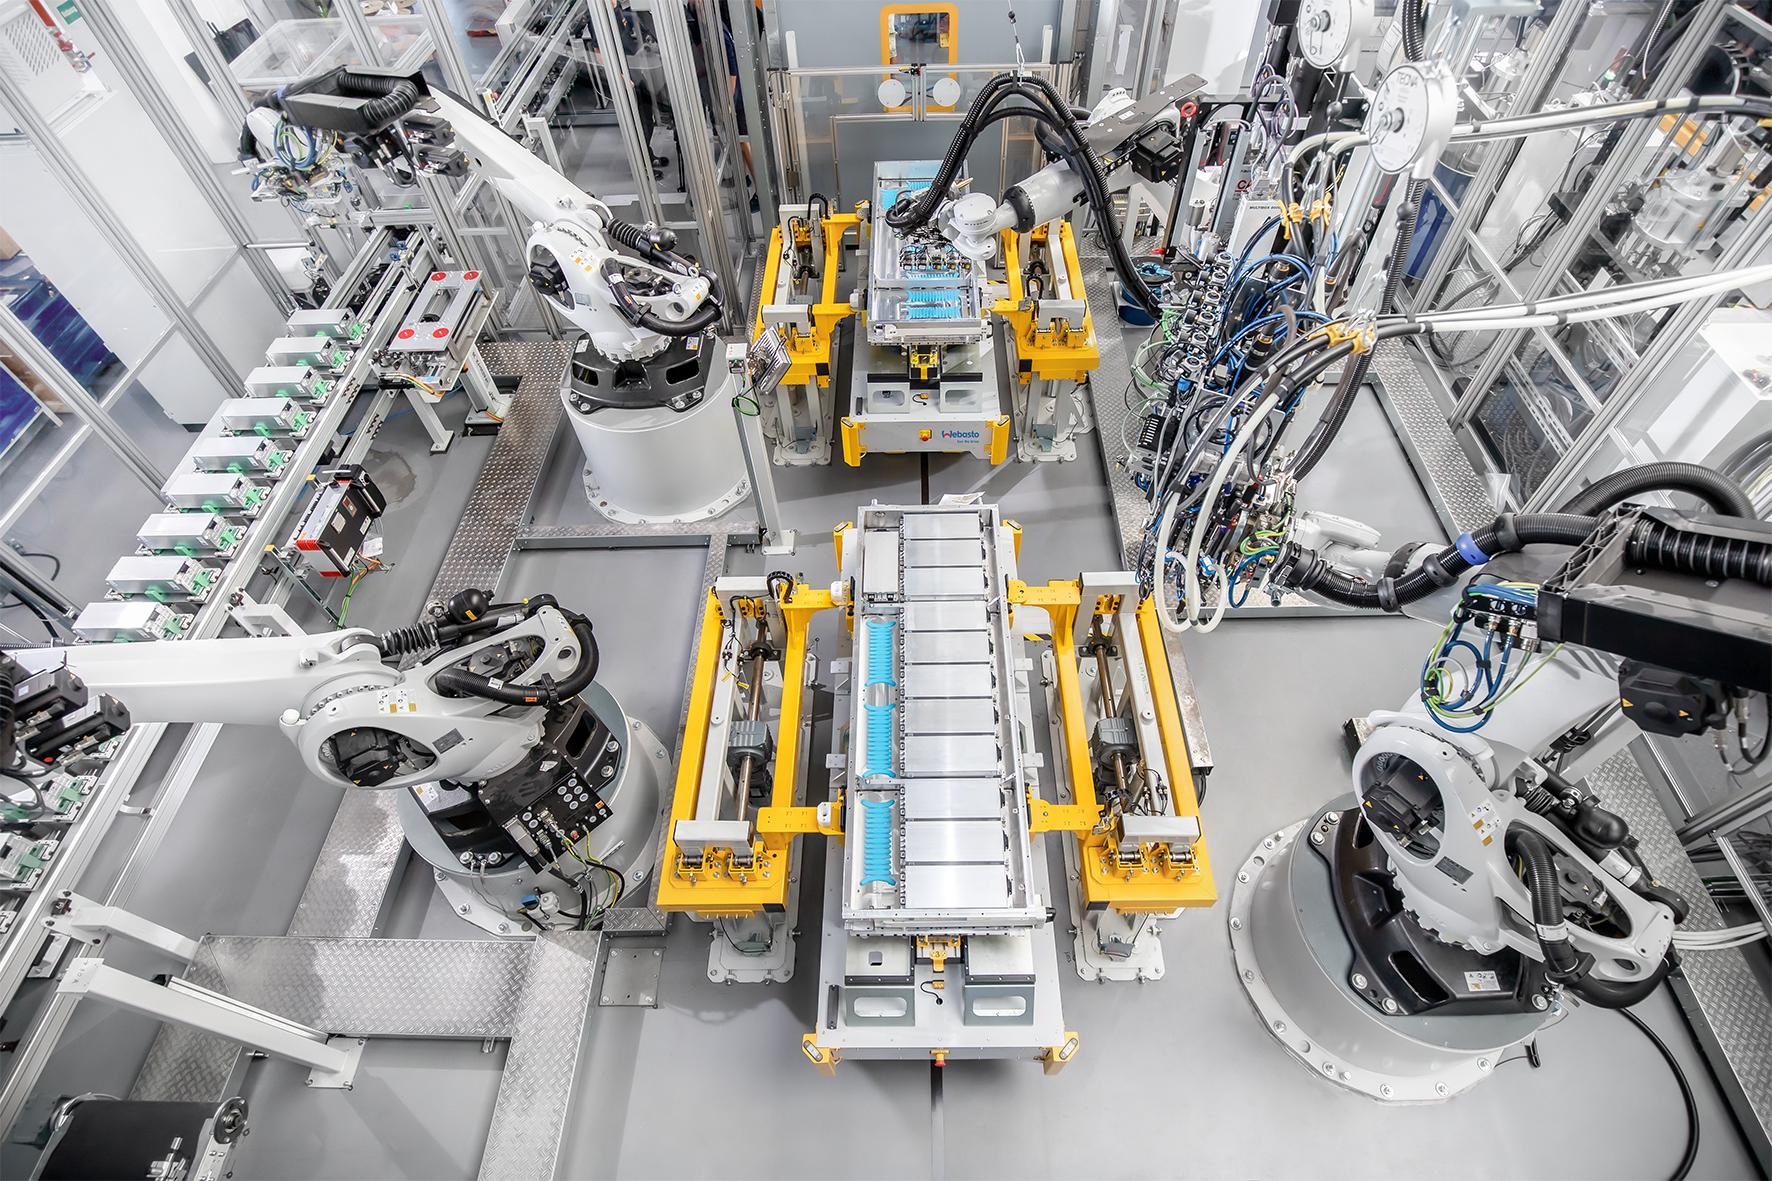 Zulieferer Webasto fertigt in Schierling Batteriepacks 01 Okt 2019 - AUTOMOBIL PRODUKTION Online